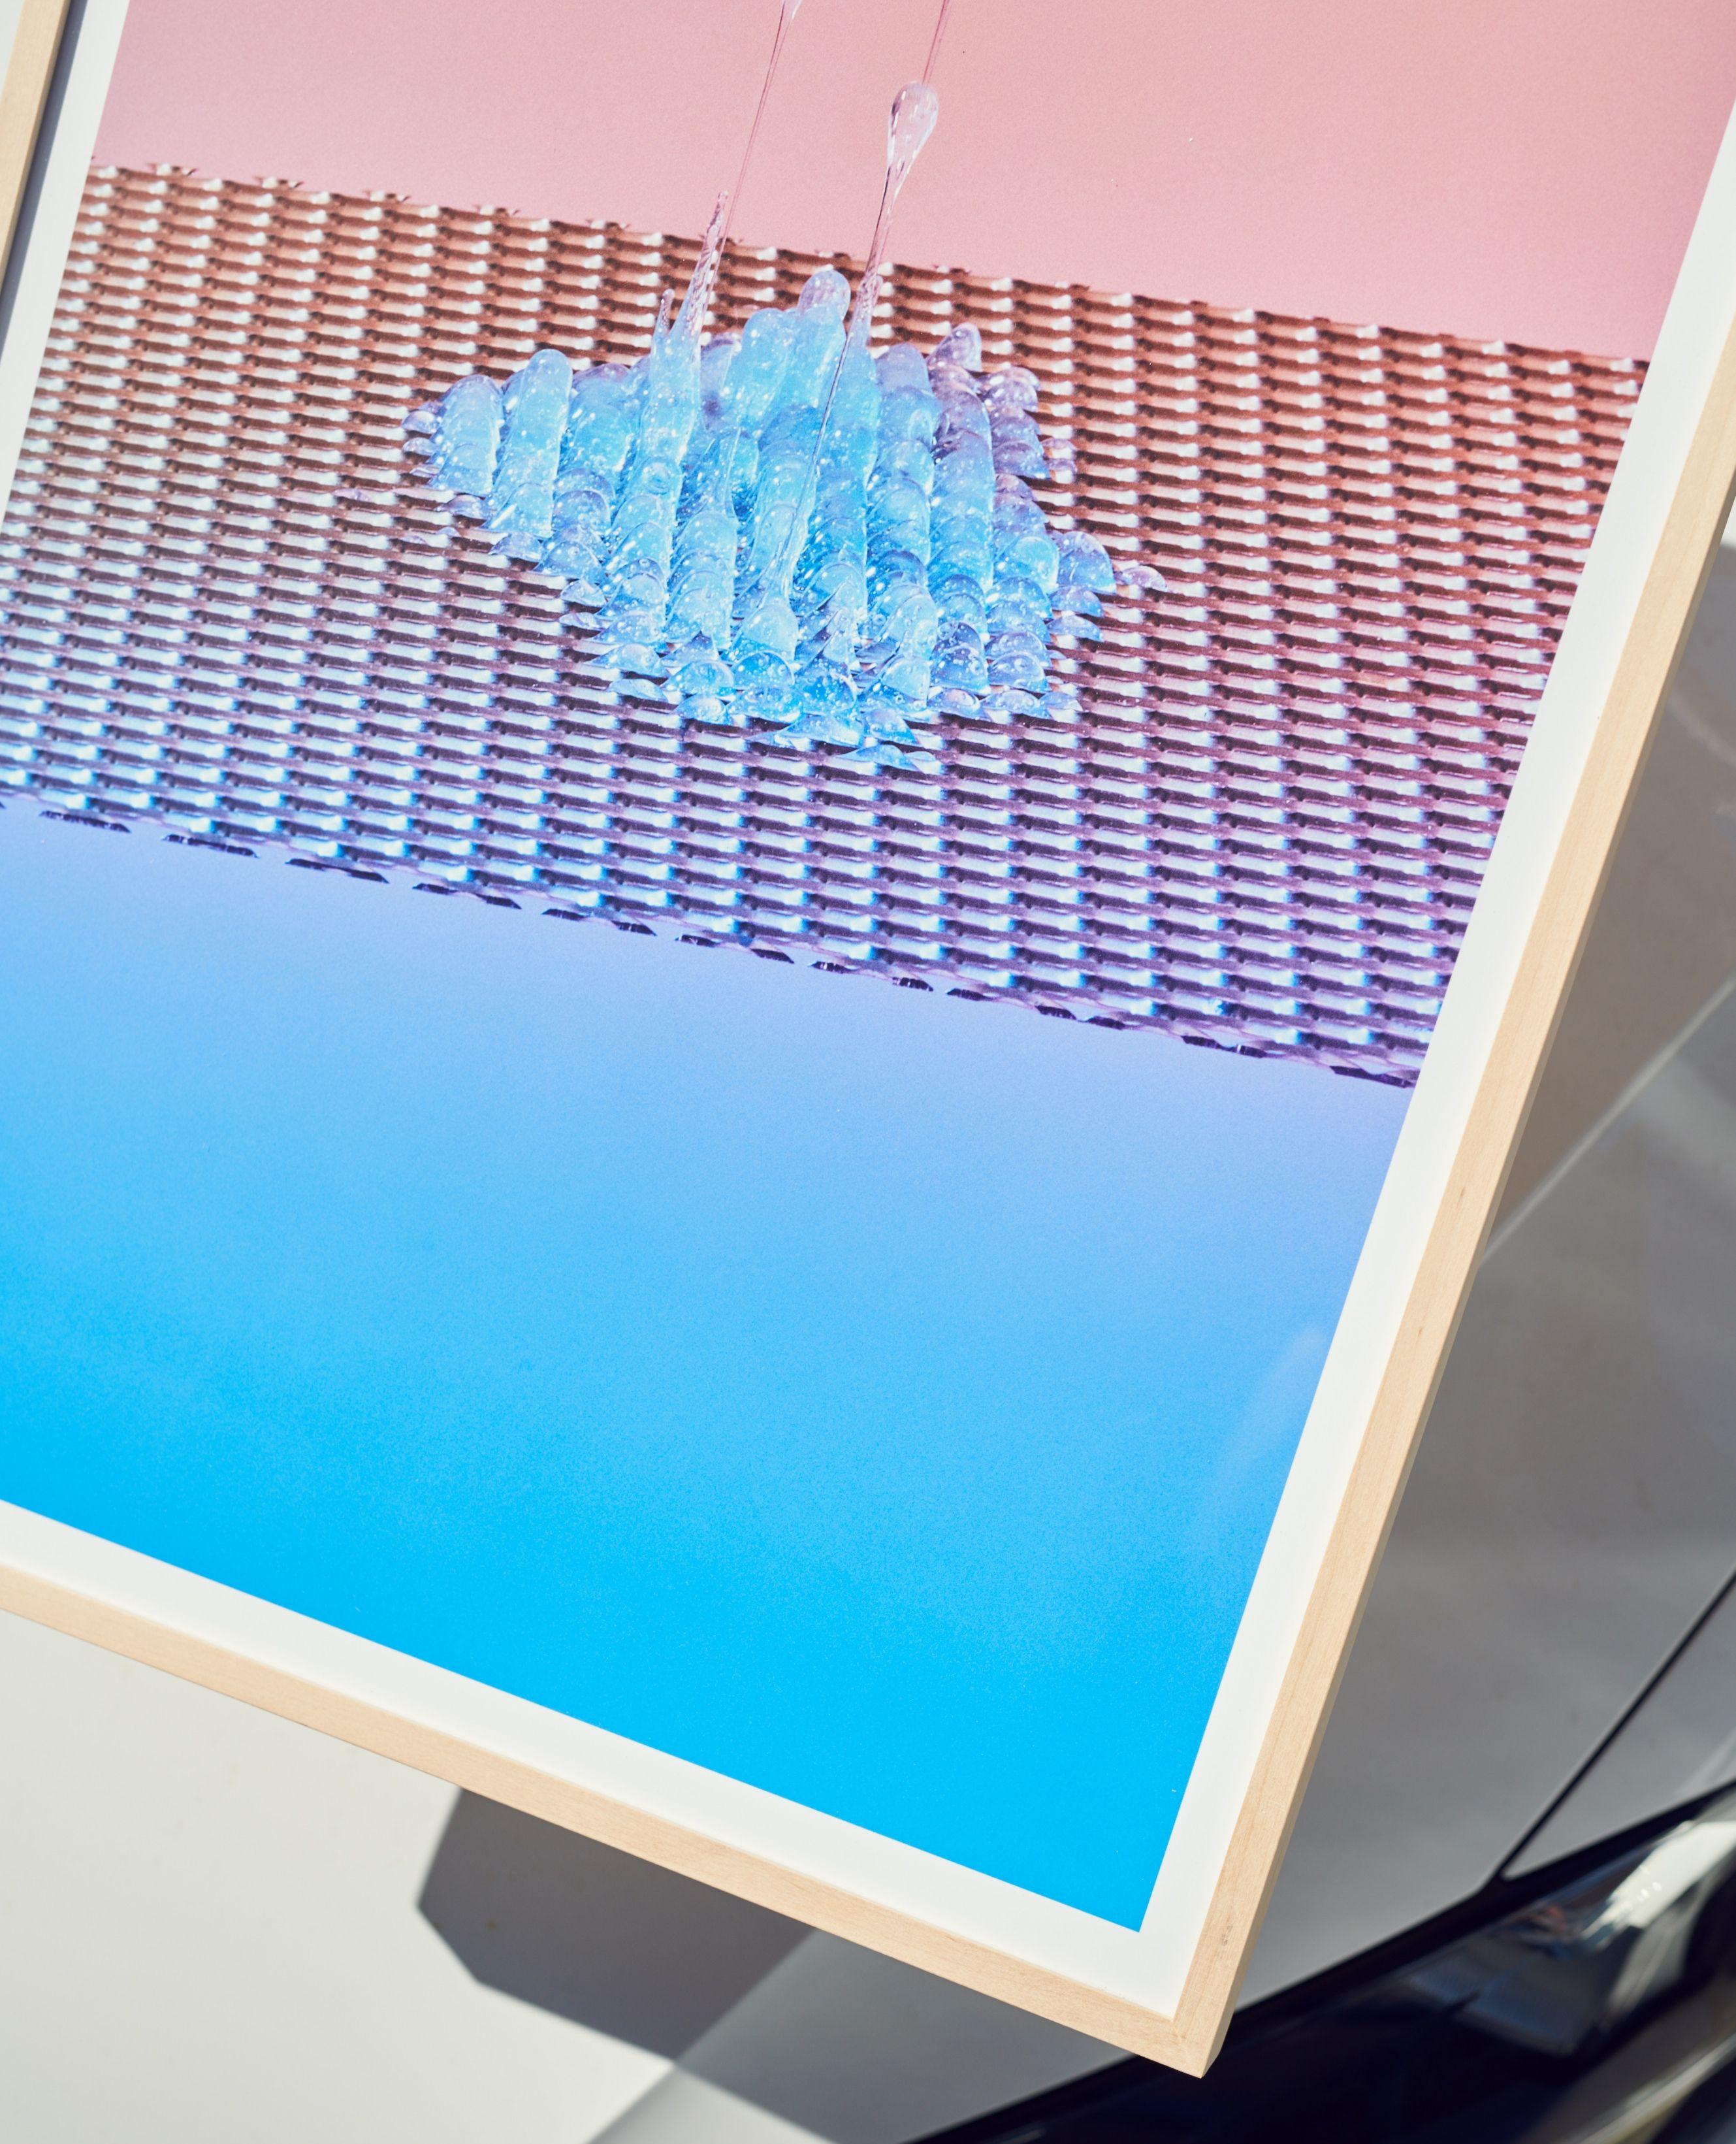 Let it Shine... . Poster Print by Philip Leutert . . . #philipleutert #edition3000 #posterprint #print #poster #wallart #readytohang #easytoorder #onlinegallery #buyposter #buyposteronline #buyart #artprint #wallposter #wallphoto #photoposter #photographyposter #artphoto #buyprint #posterforsale #greatposter #amazingposter #coolposter #madeinswitzerland #swissmade #posterlove #lovethisposter #printlove #artprint #printart